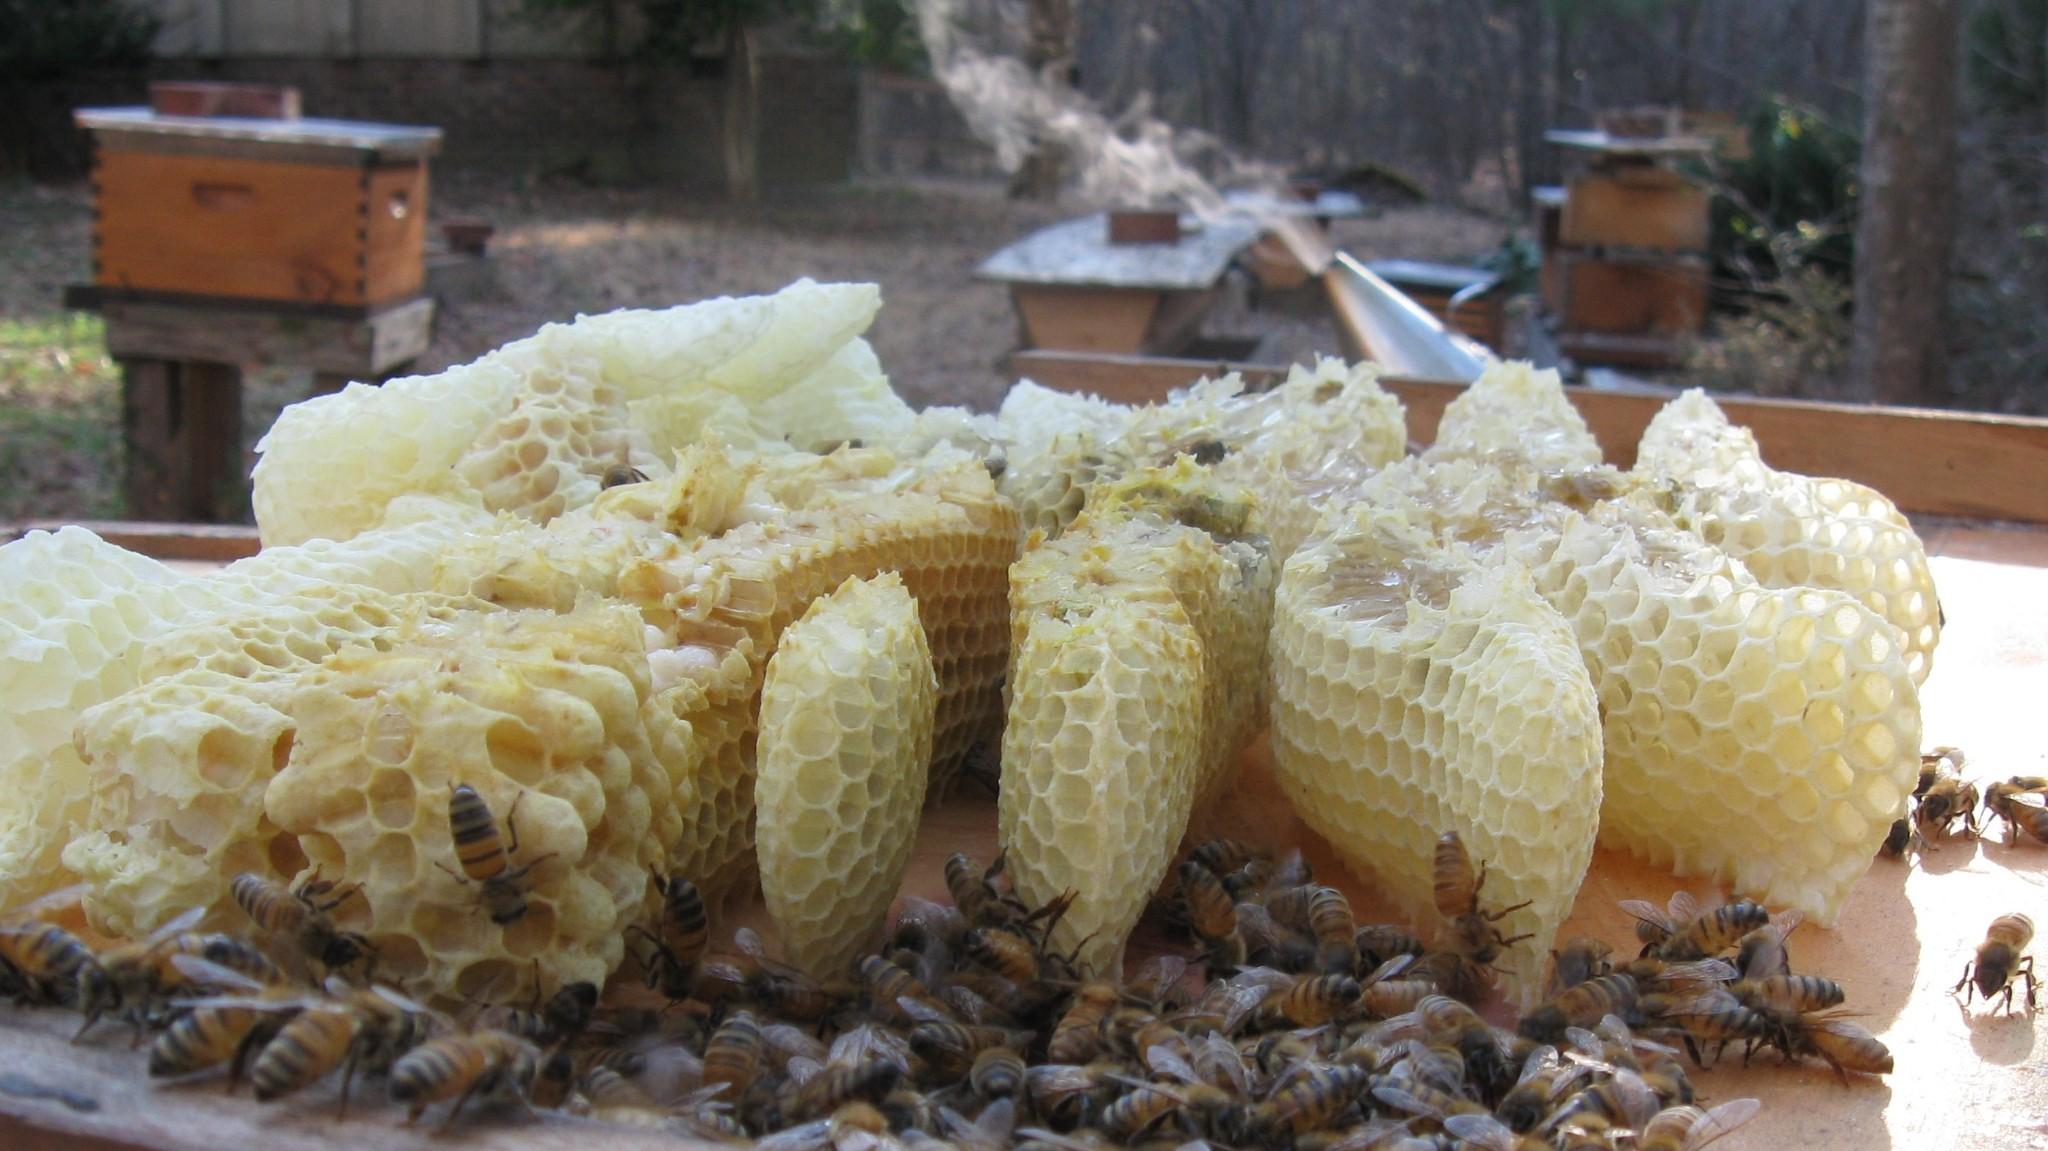 Bees, Burr Comb and Smoker, 2013 (c) The Carolina Bee Company